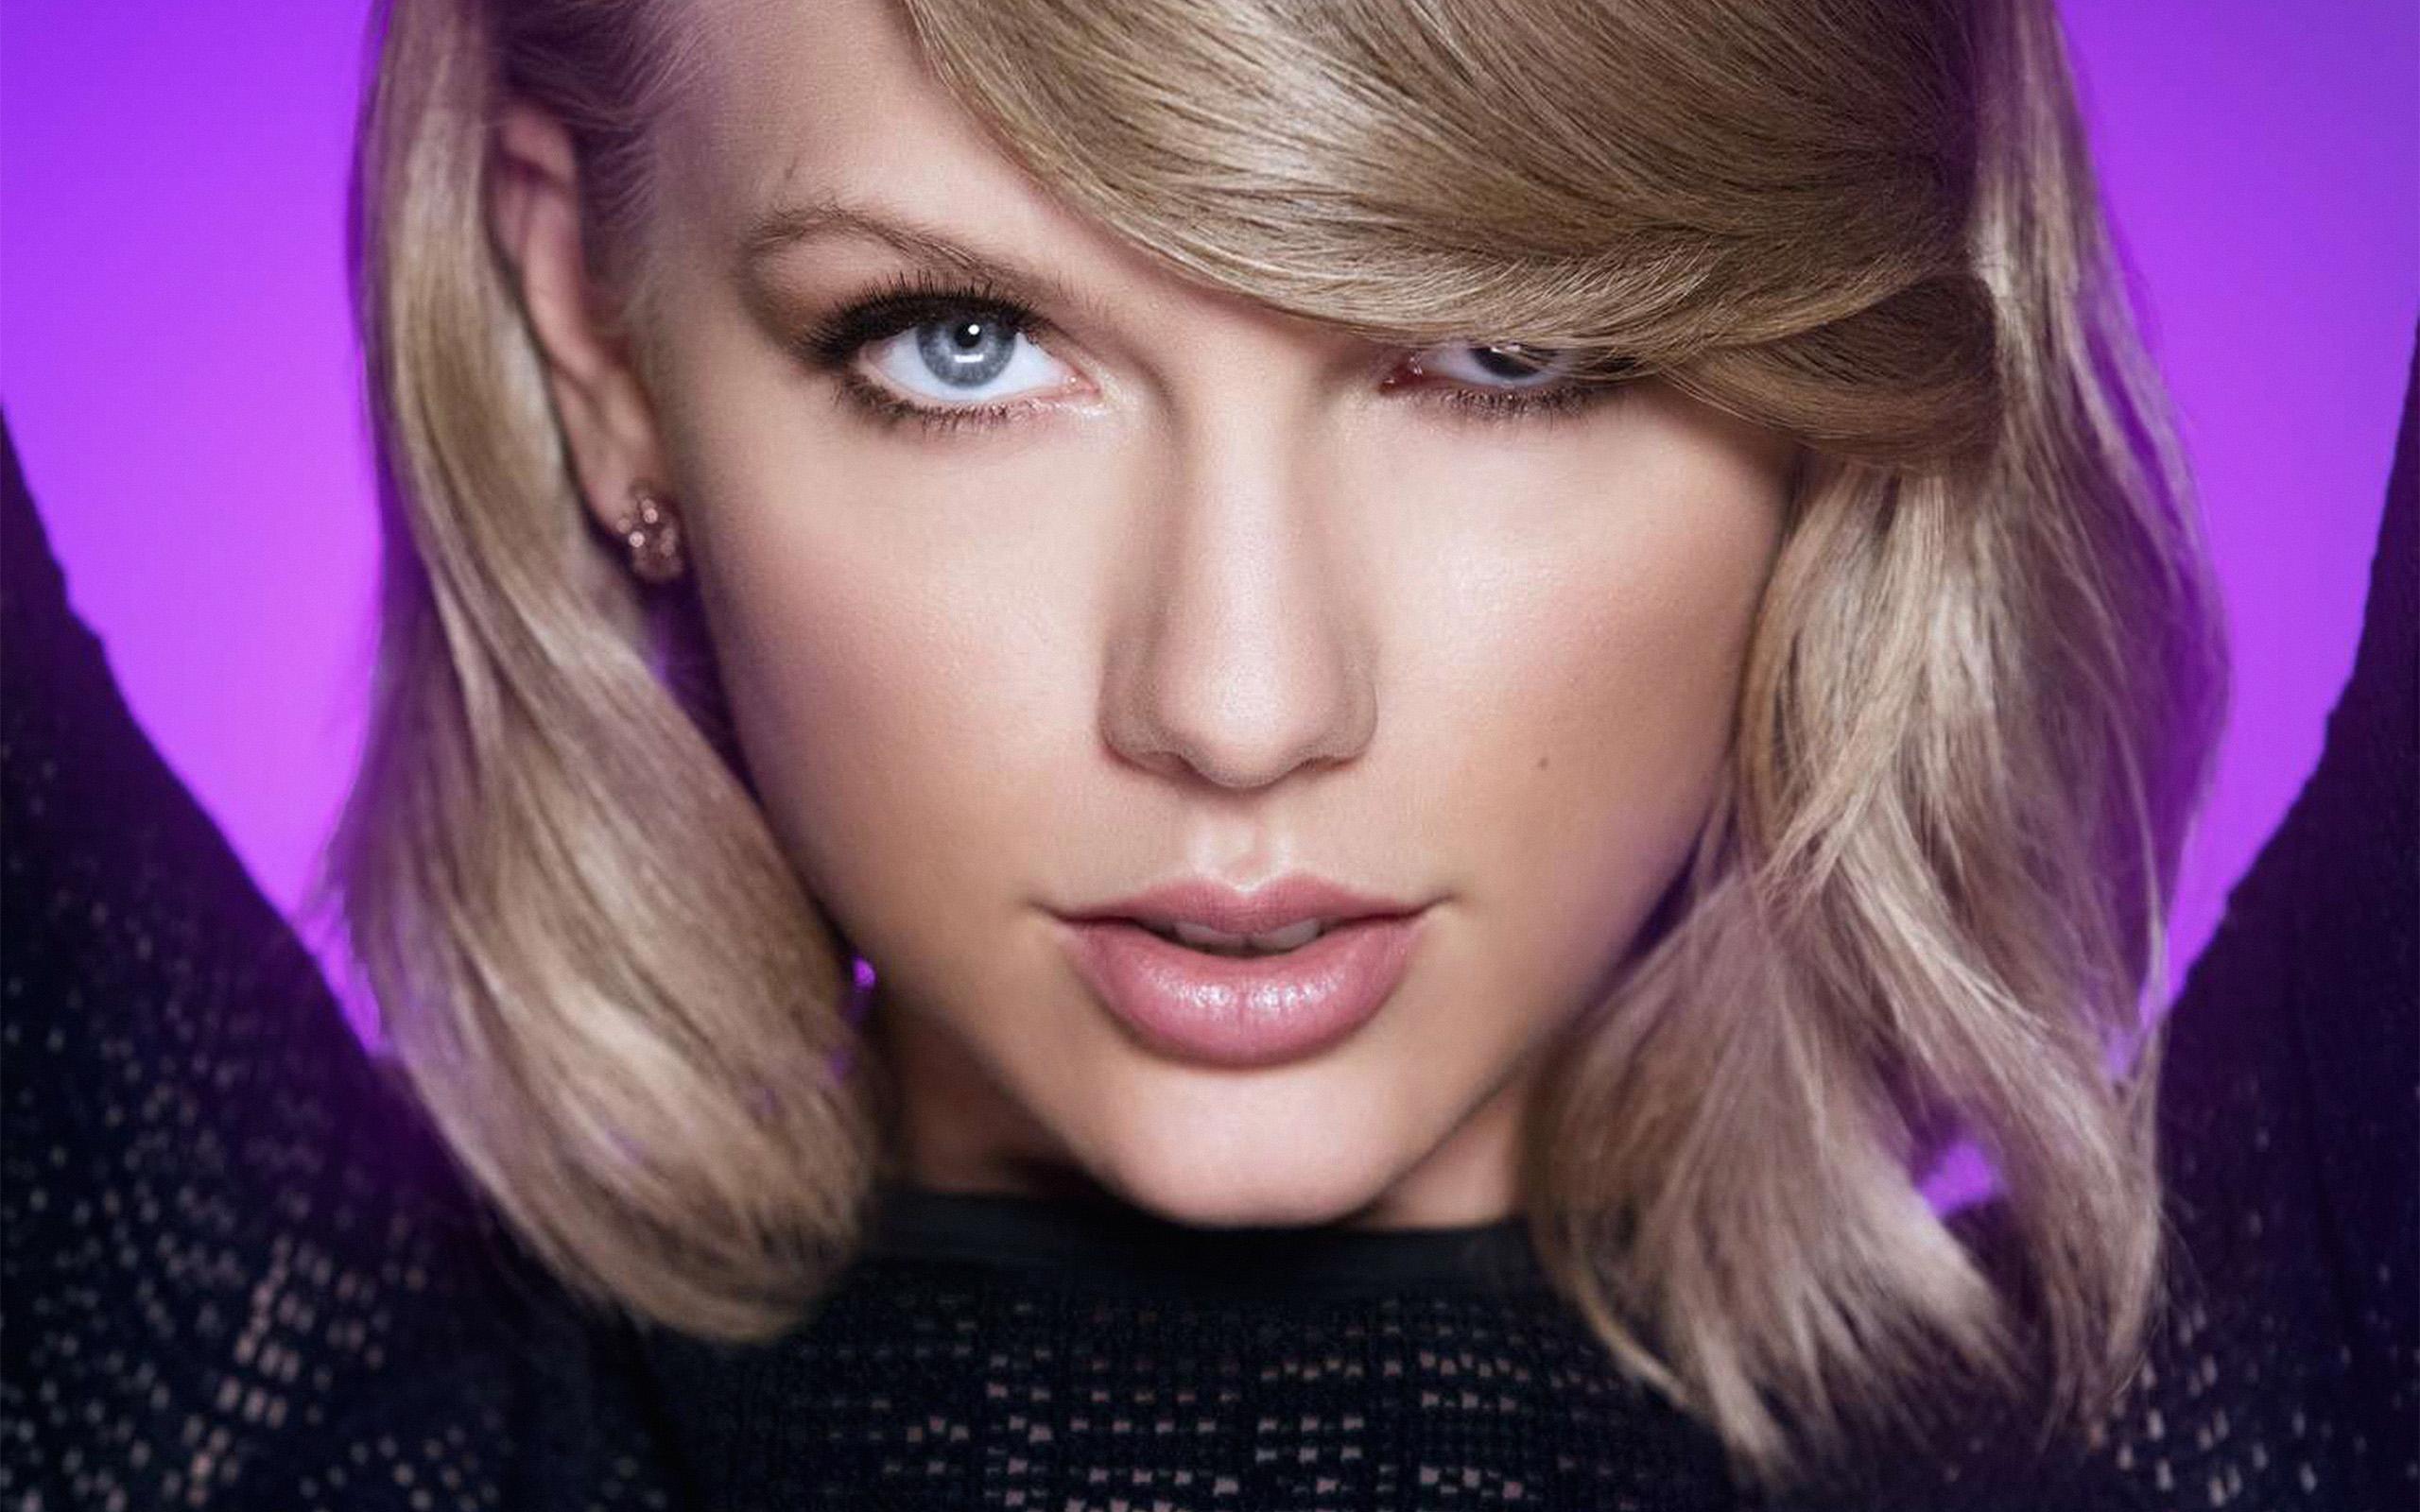 hi53-taylor-swift-face-music-celebrity-wallpaper